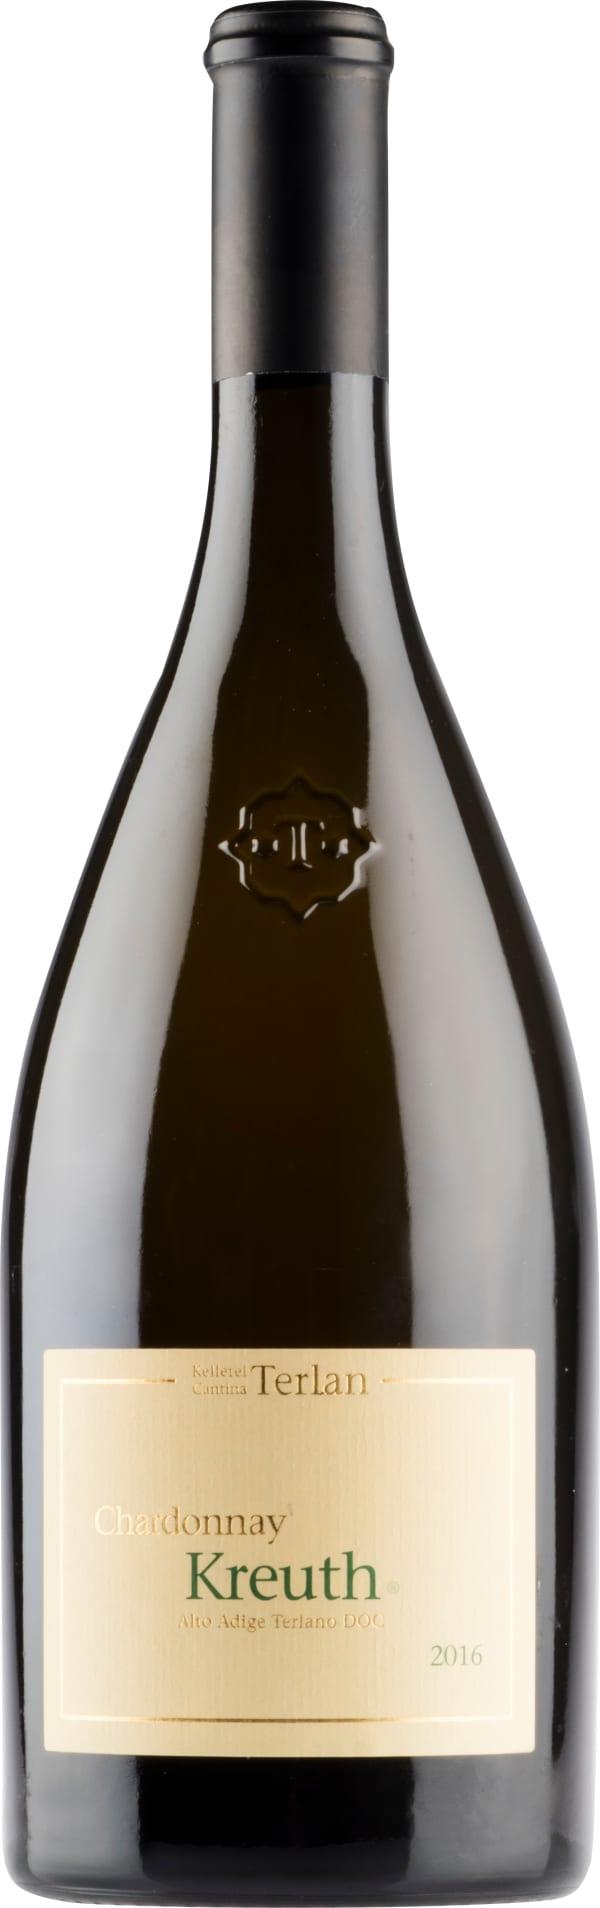 Cantina Terlan Kreuth Chardonnay 2016